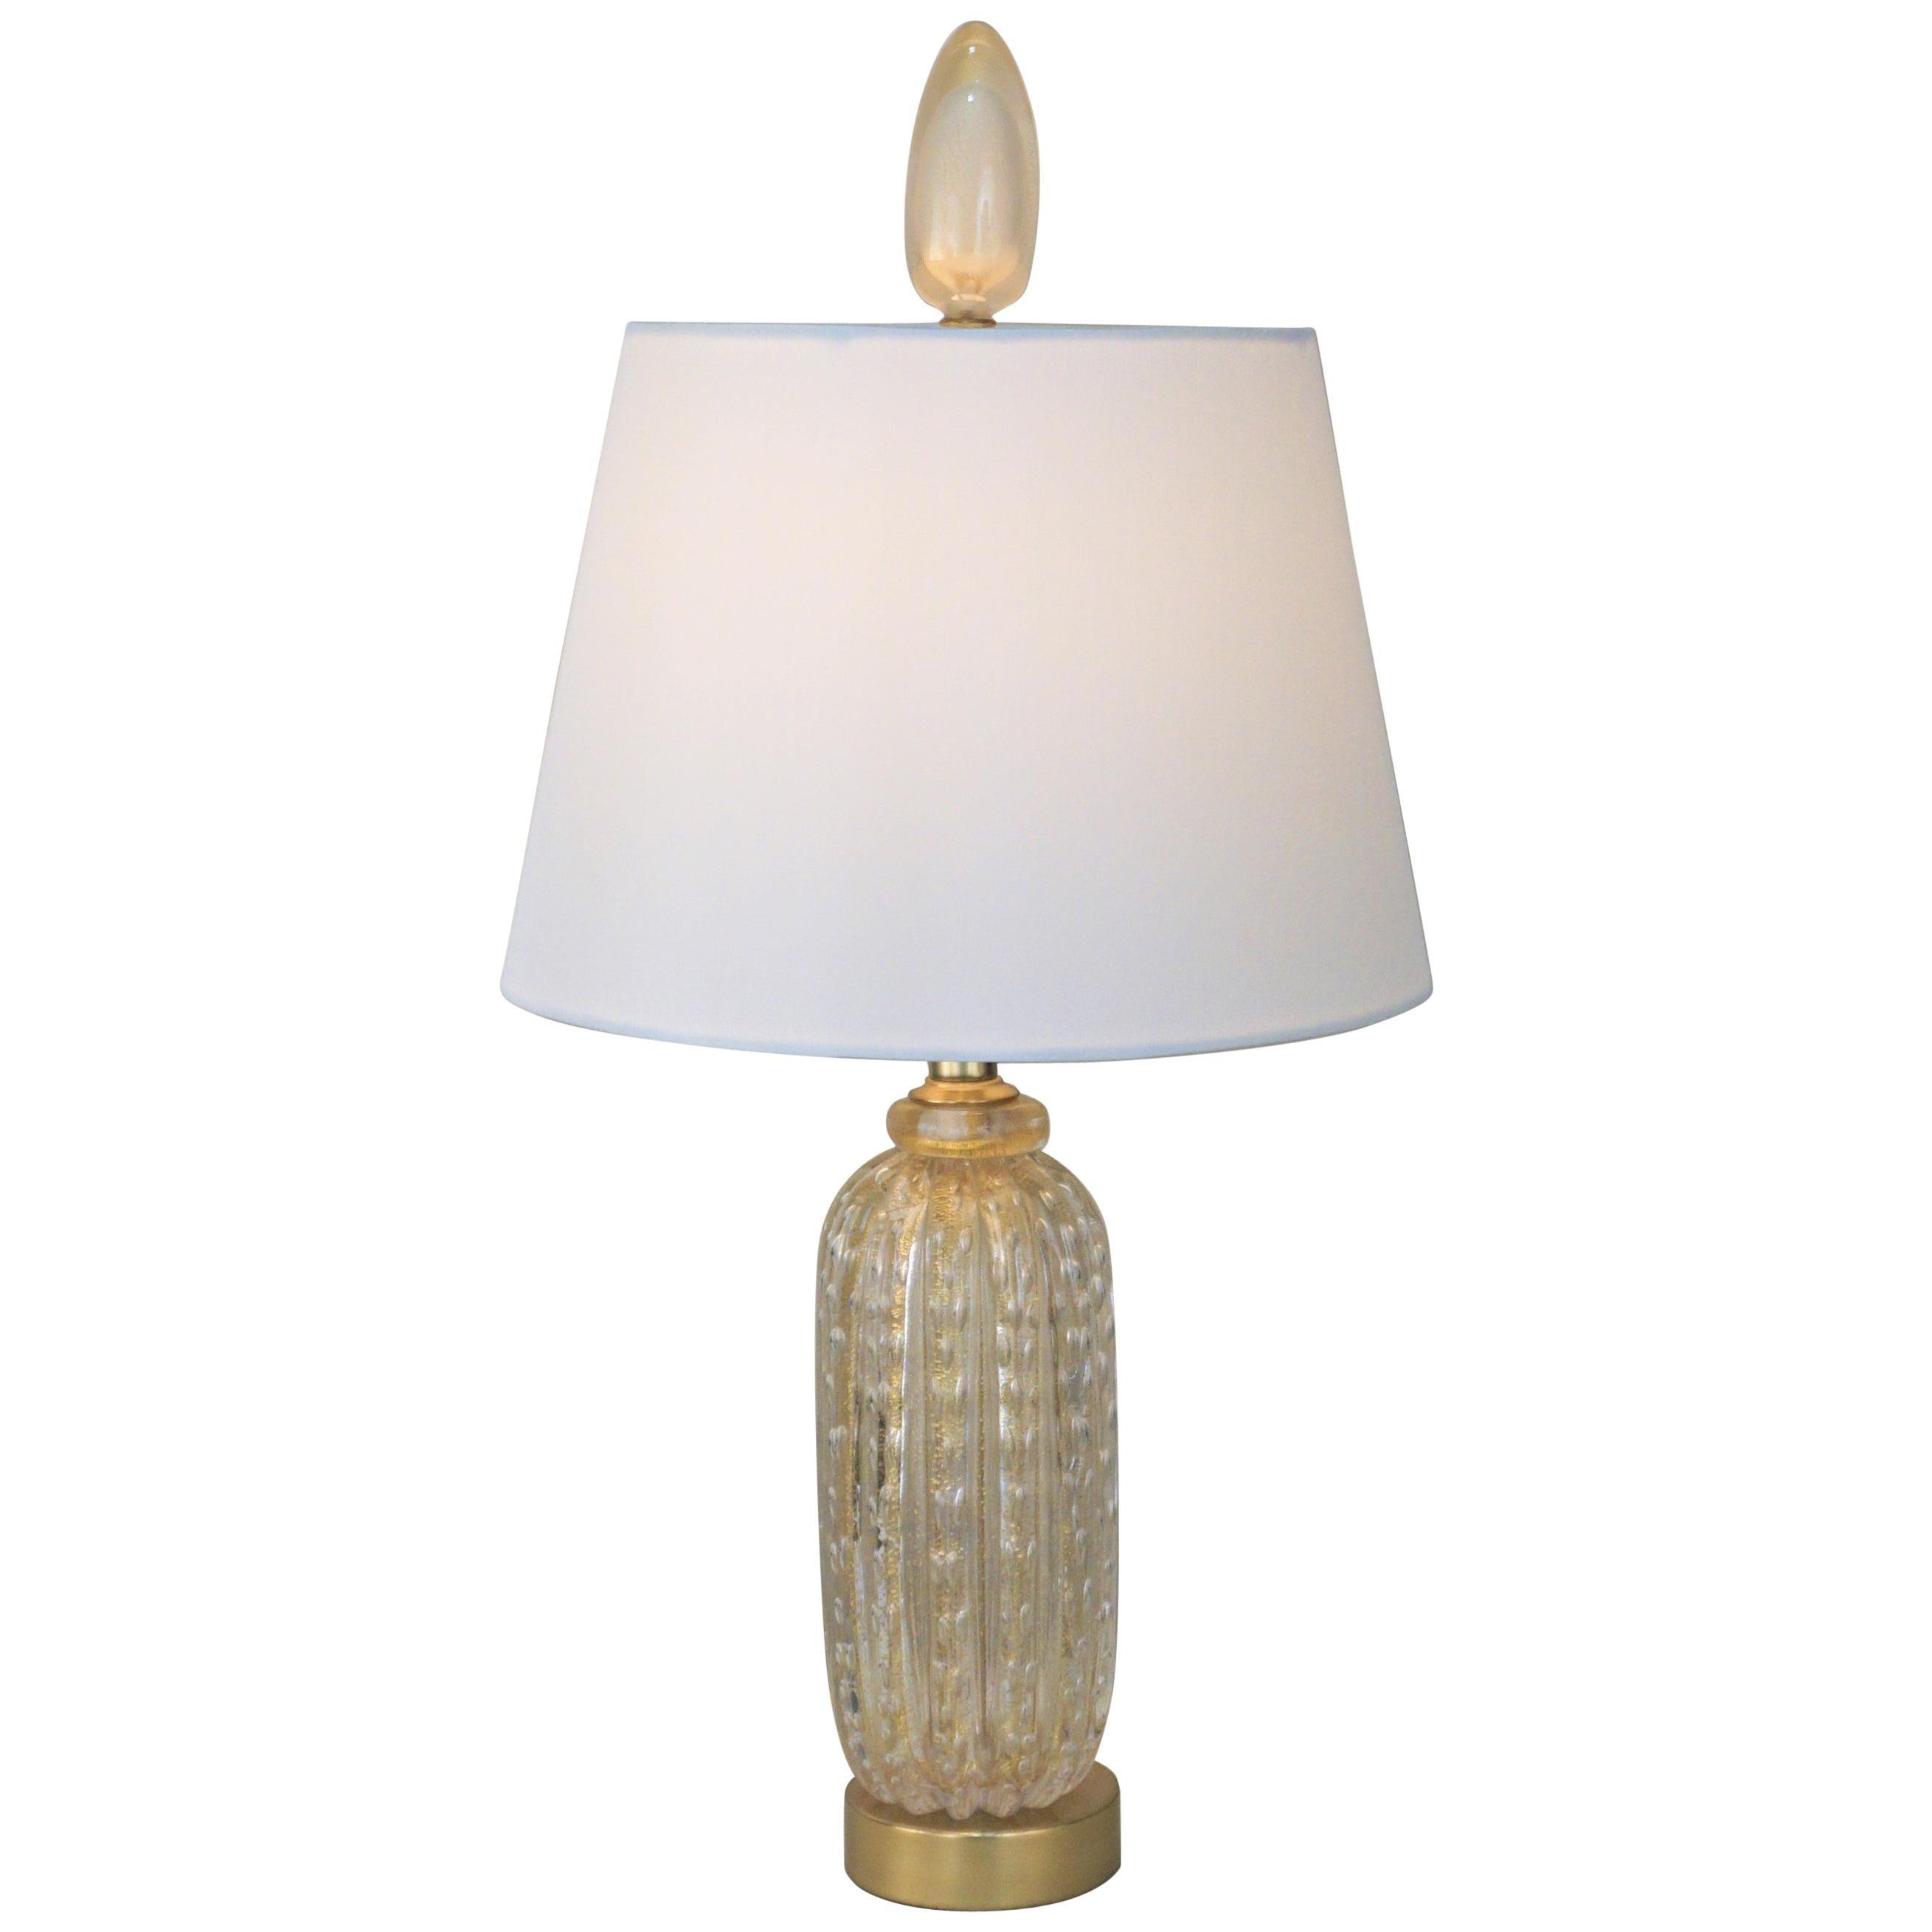 Murano Glass 1970s Table Lamp